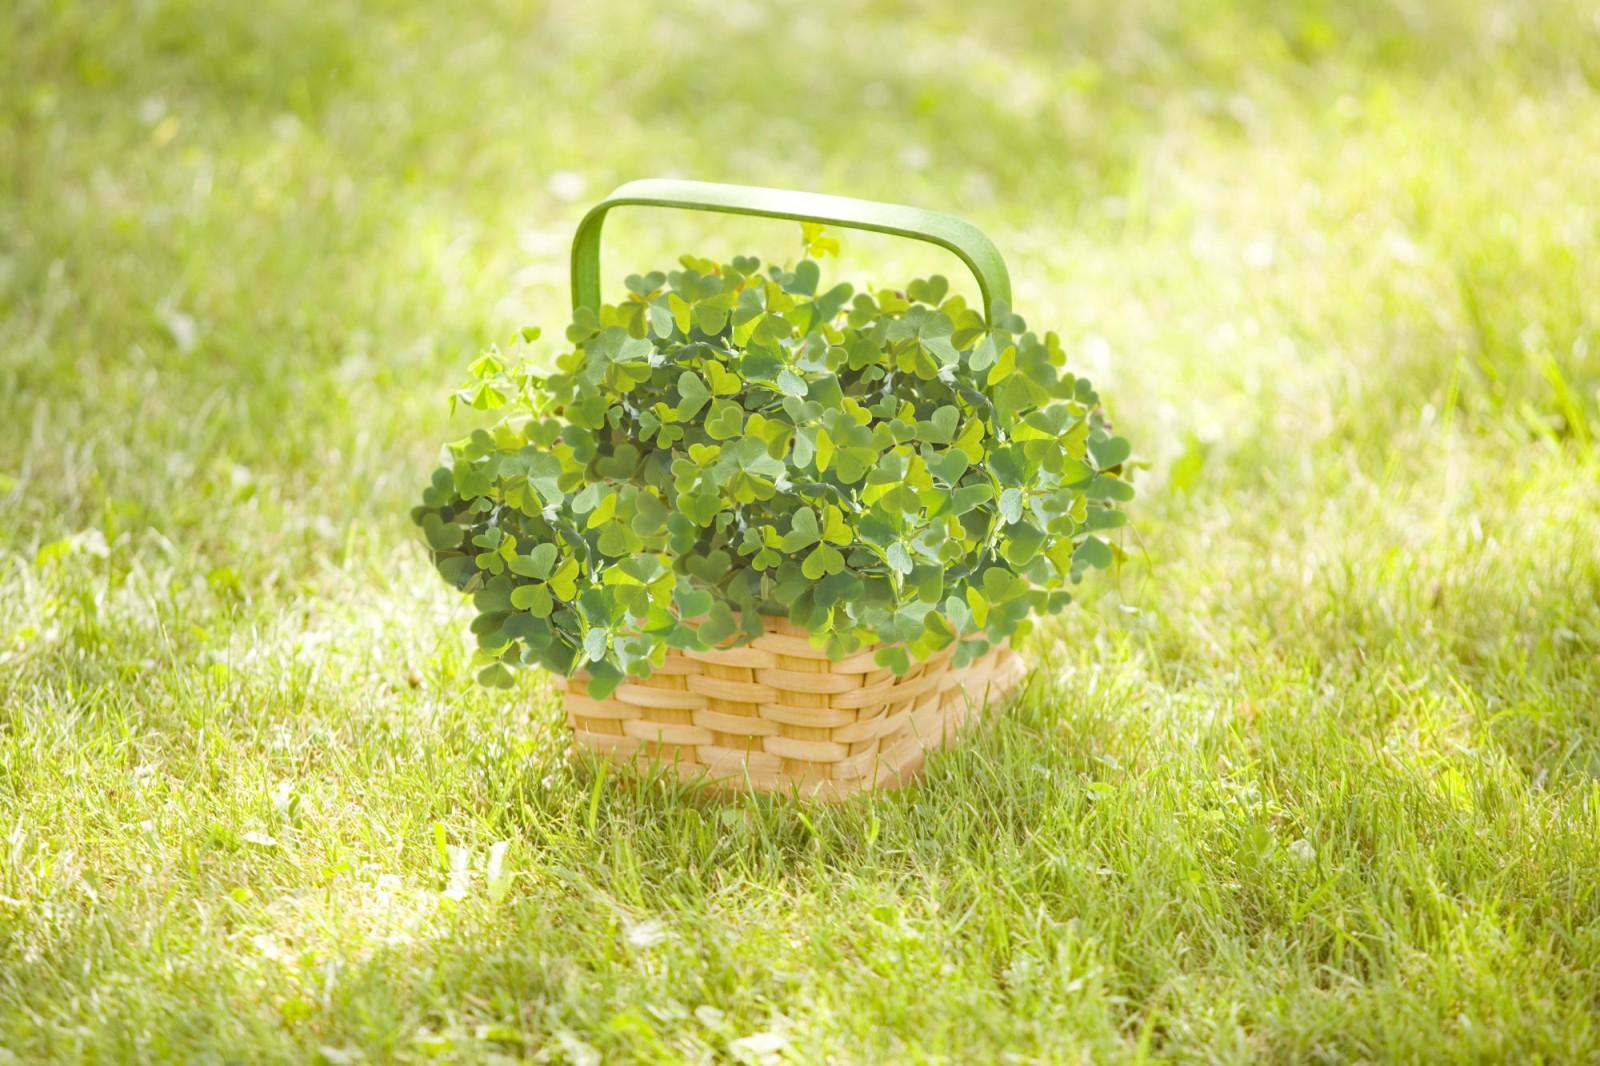 http://1.bp.blogspot.com/_b-YuSdvMmaQ/SwlbssRrUyI/AAAAAAAADbE/7O1YSCe2t0g/s1600/basket+of+clover.jpg